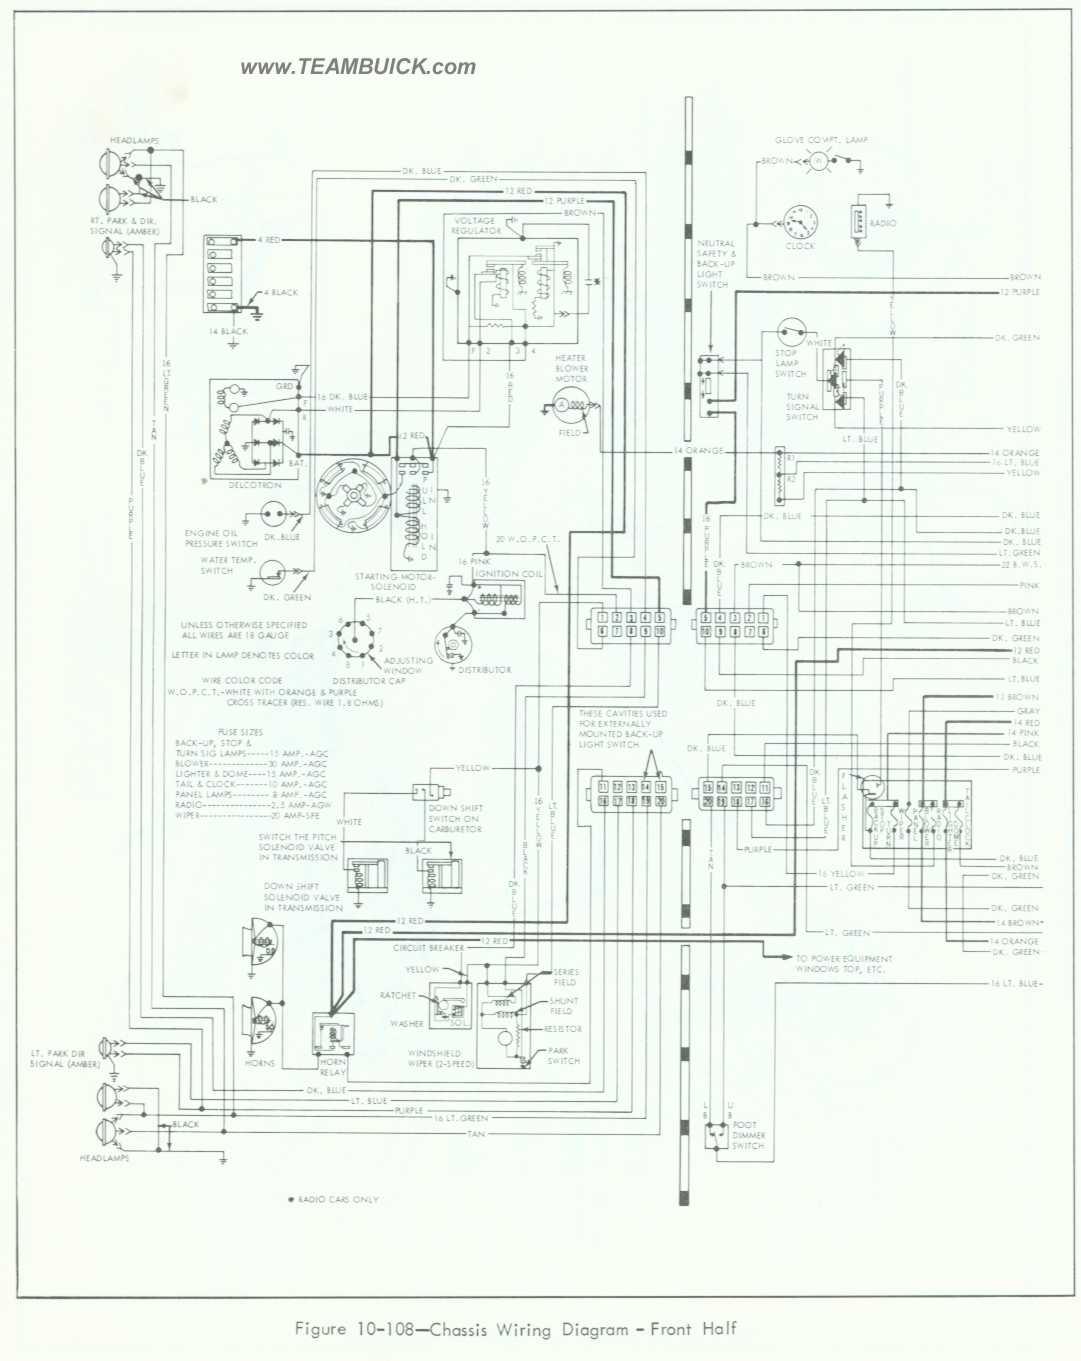 1964 Buick Special - Skylark Wiring Diagram, Front Half